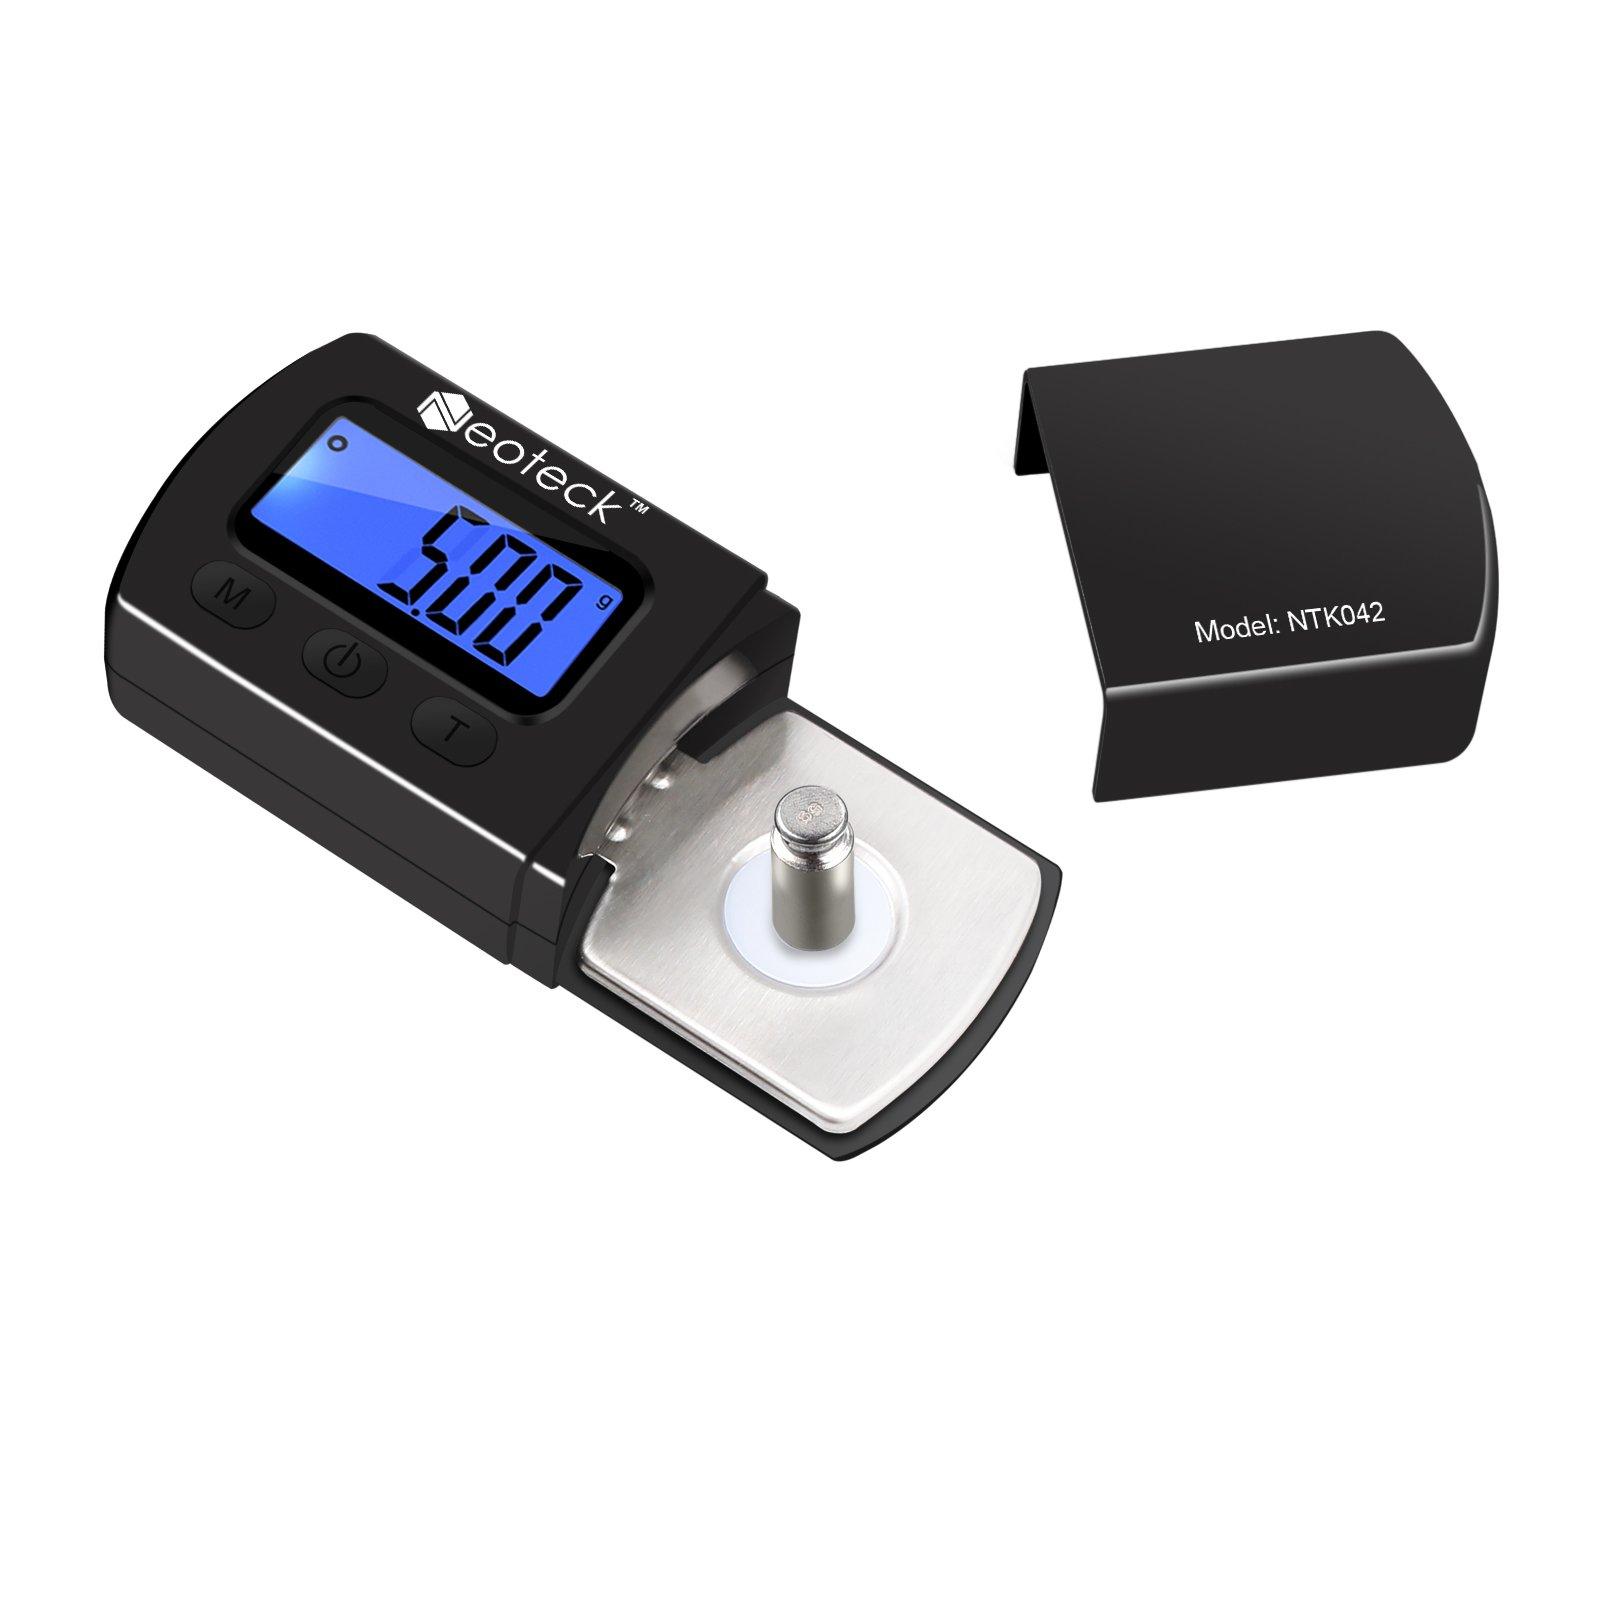 Neoteck Digital Turntable Stylus Force Scale Gauge 0.01g/5.00g Blue LCD Backlight for Tonearm Phono Cartridge-Jet Black